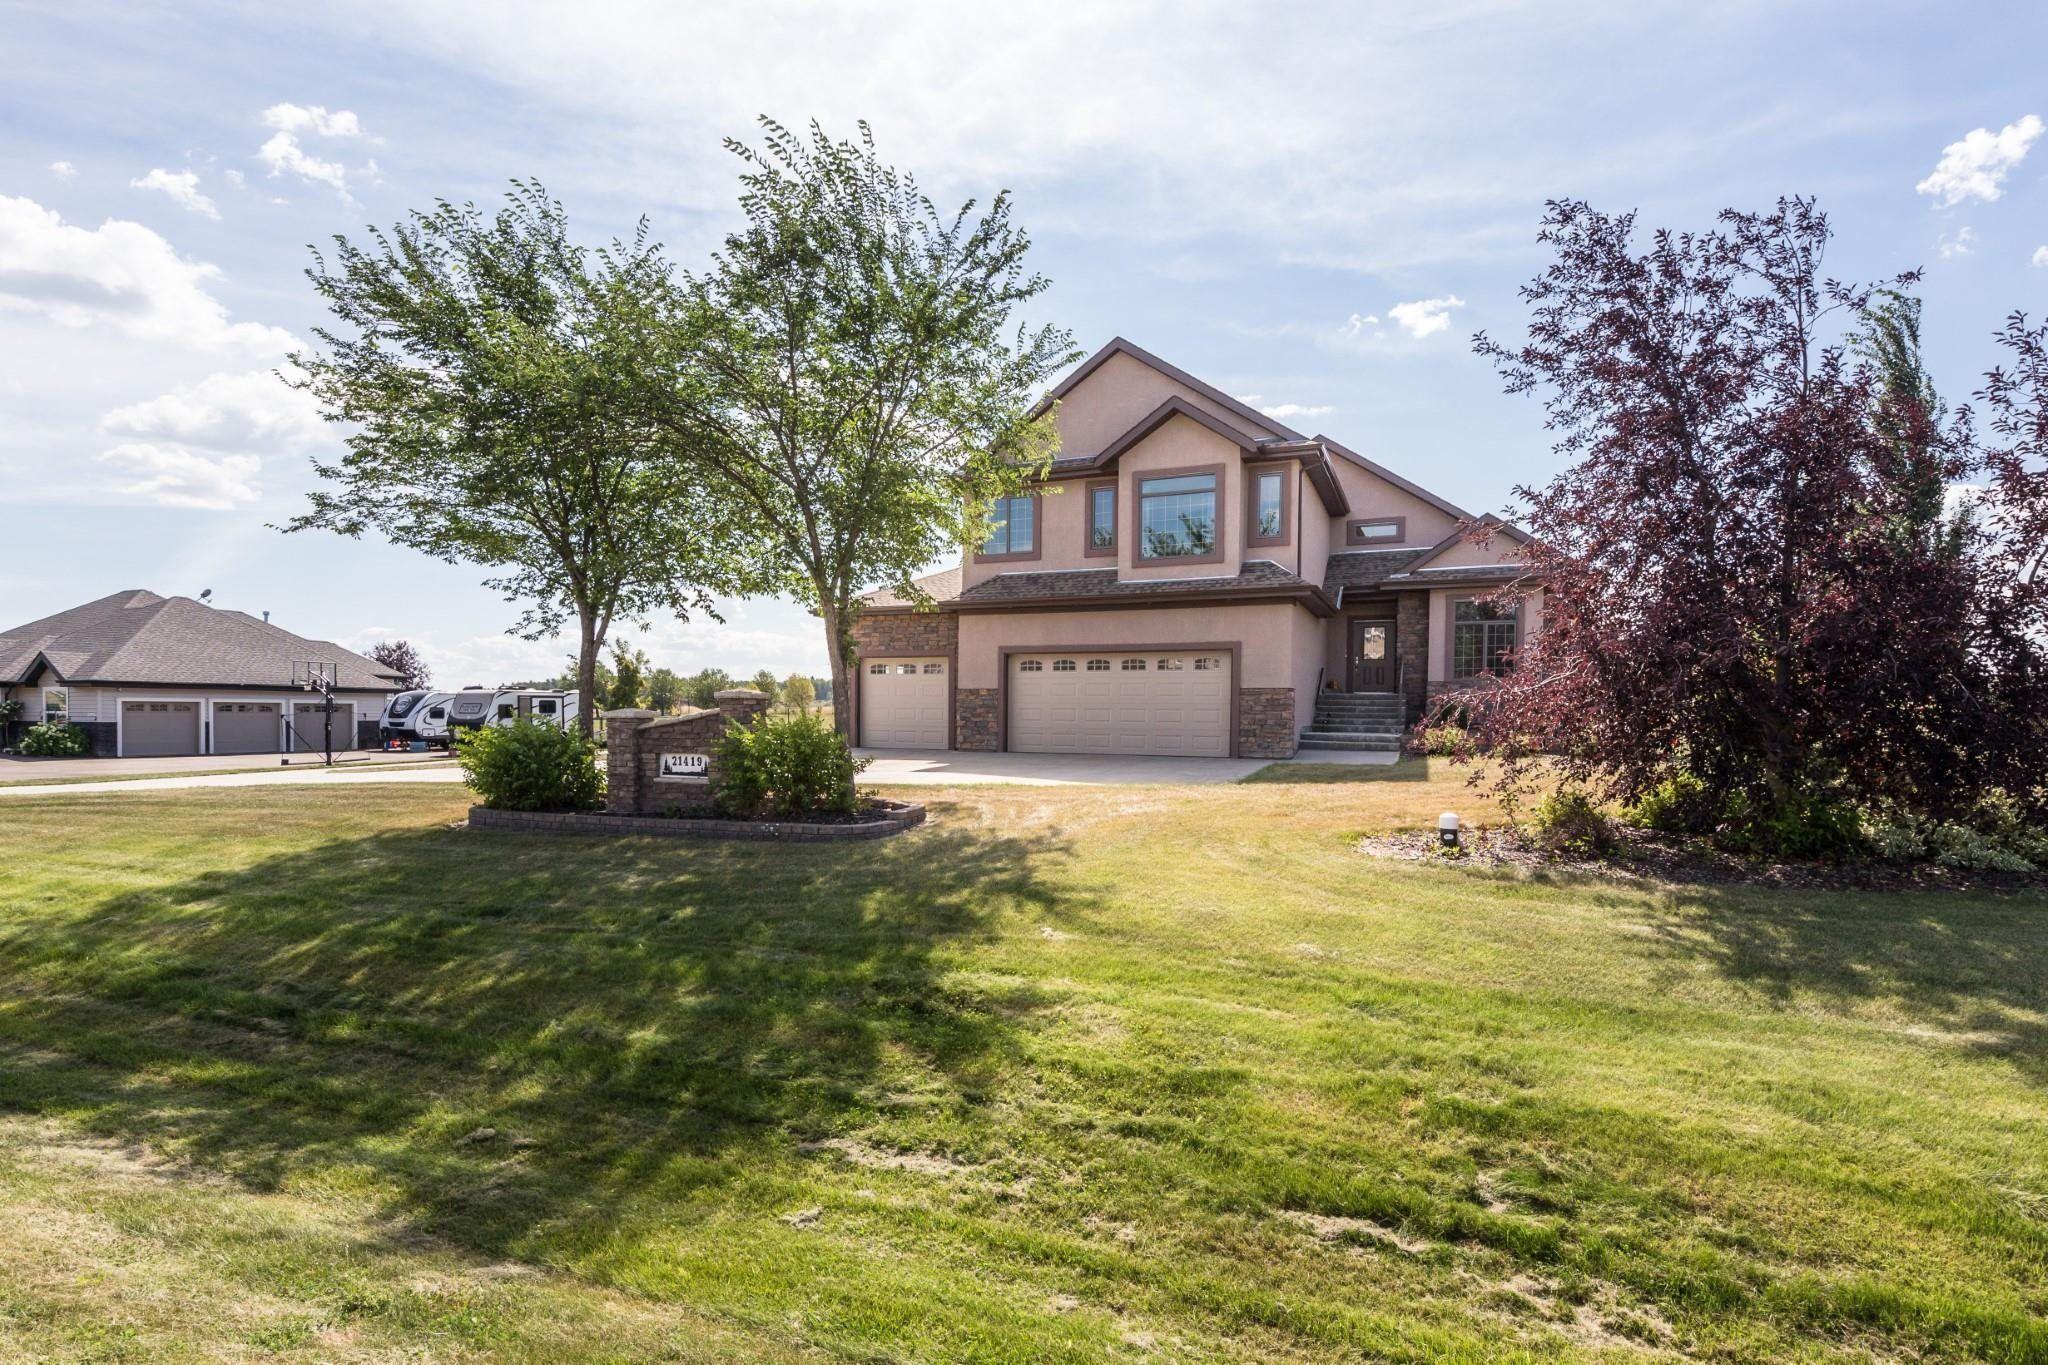 Main Photo: 21419 25 Avenue in Edmonton: Zone 57 House for sale : MLS®# E4258942